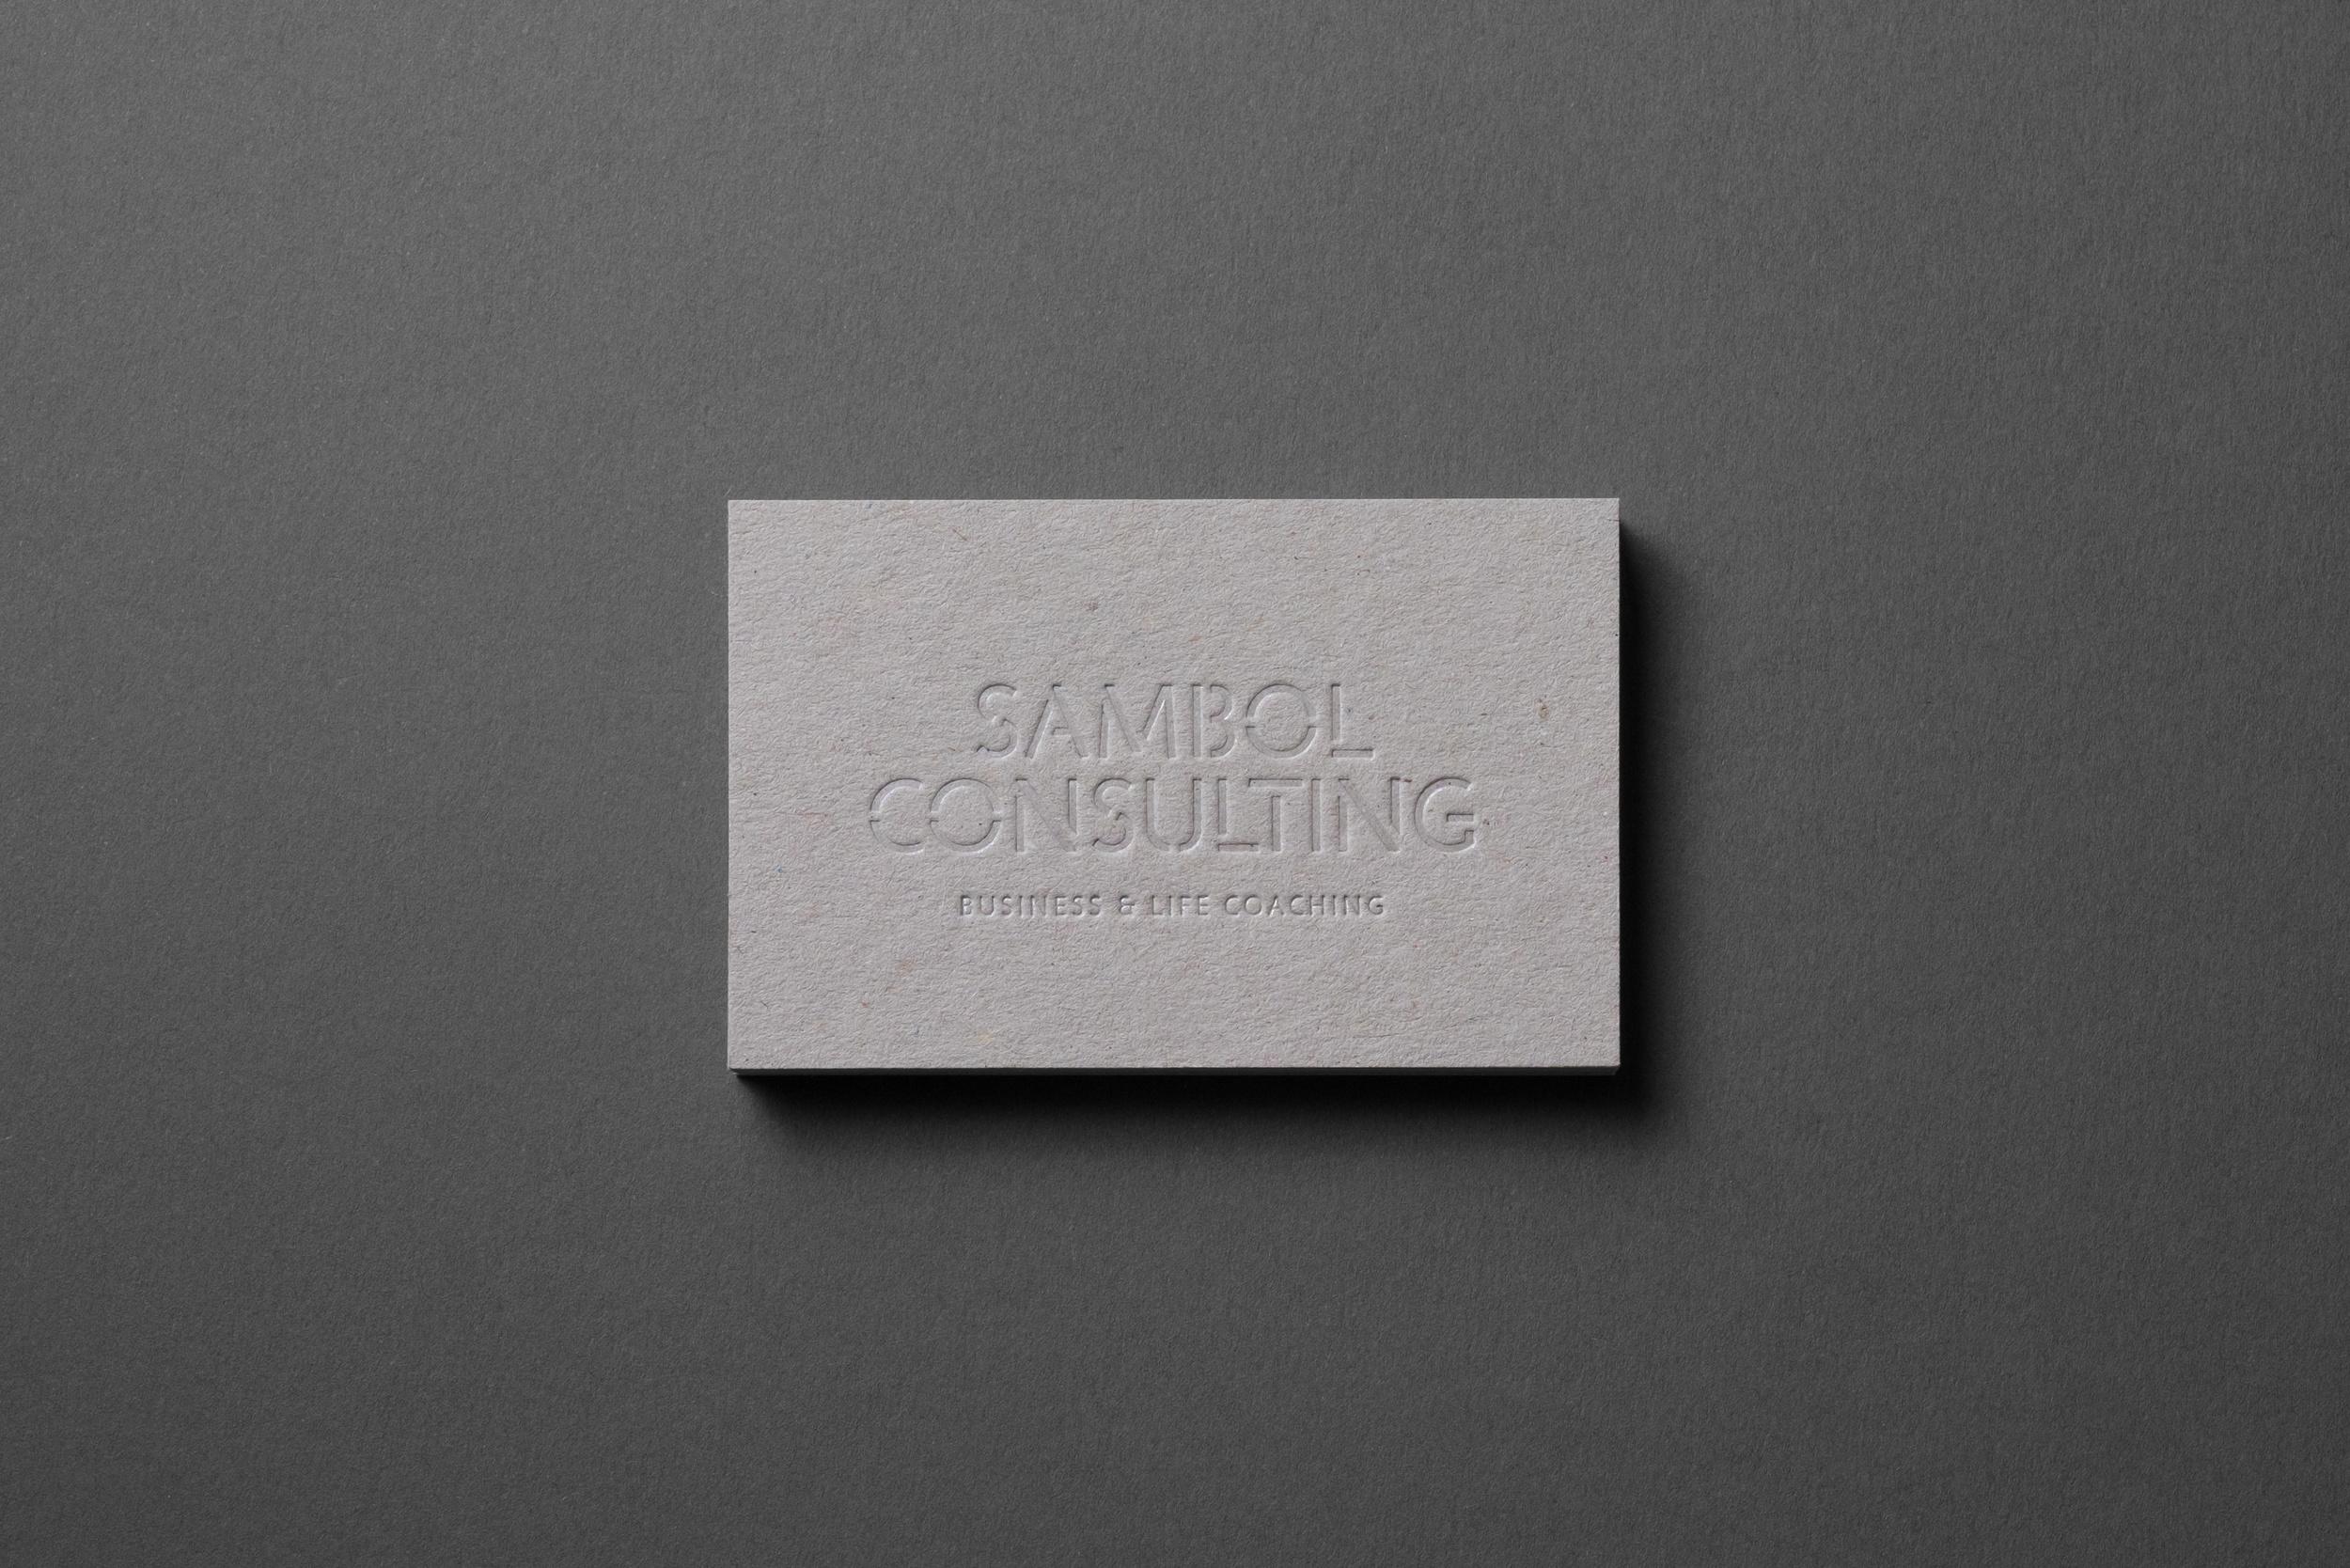 sambol_consulting_bcard01.jpg